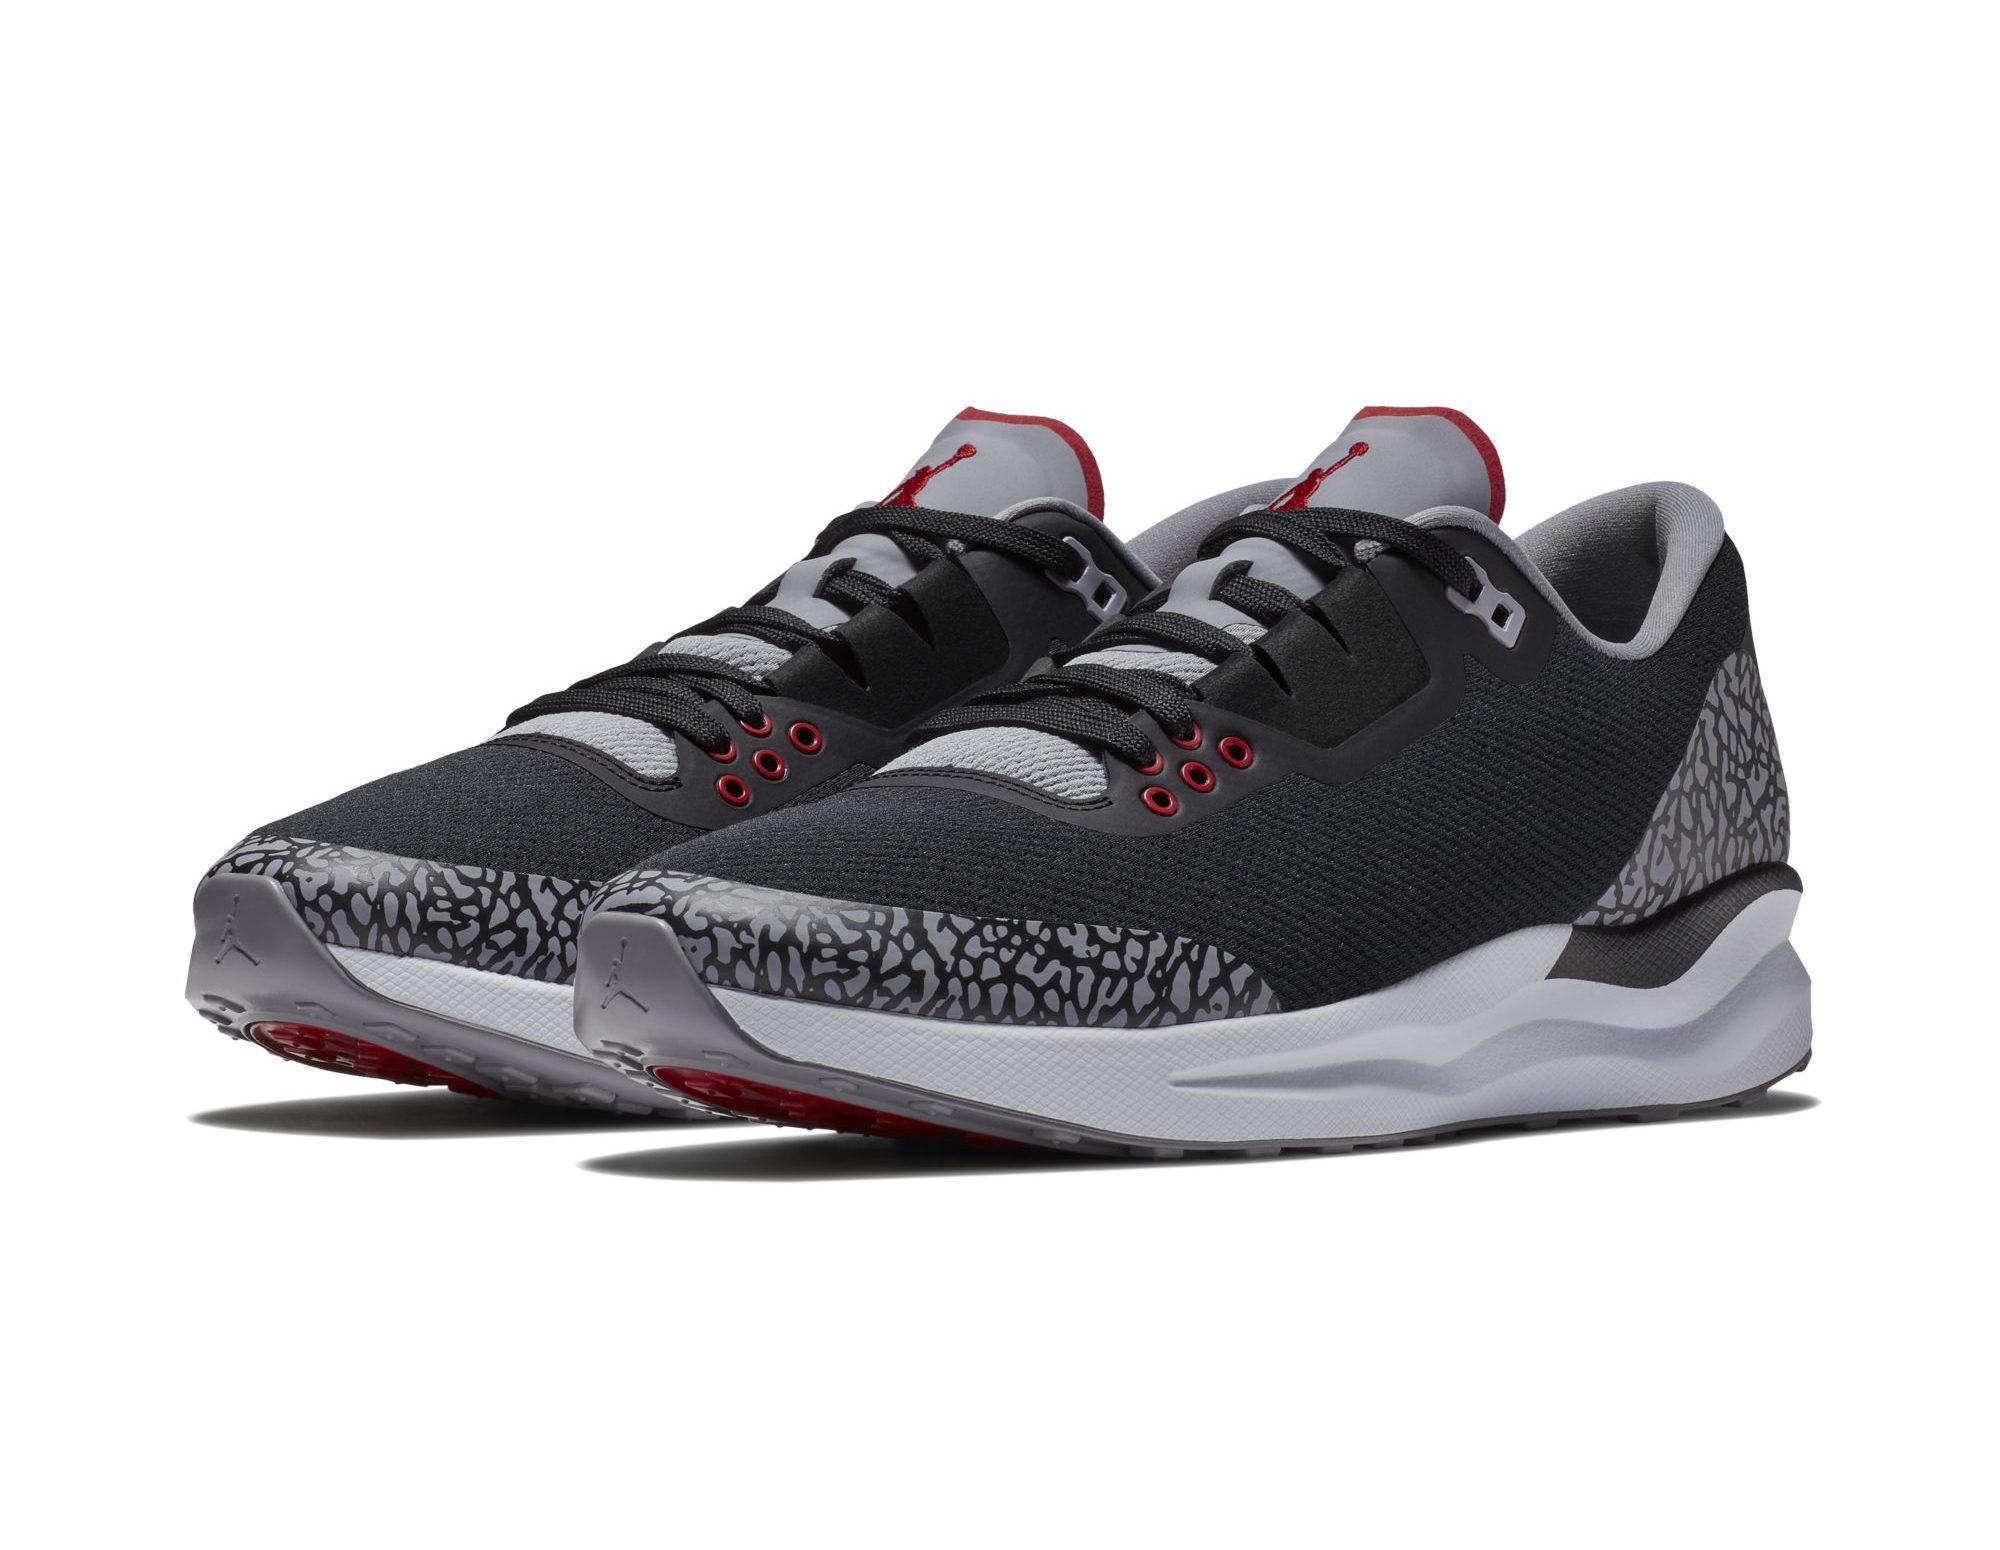 d189608345165 The Jordan Zoom Tenacity 88 Dons OG Air Jordan 3 Colorways - WearTesters